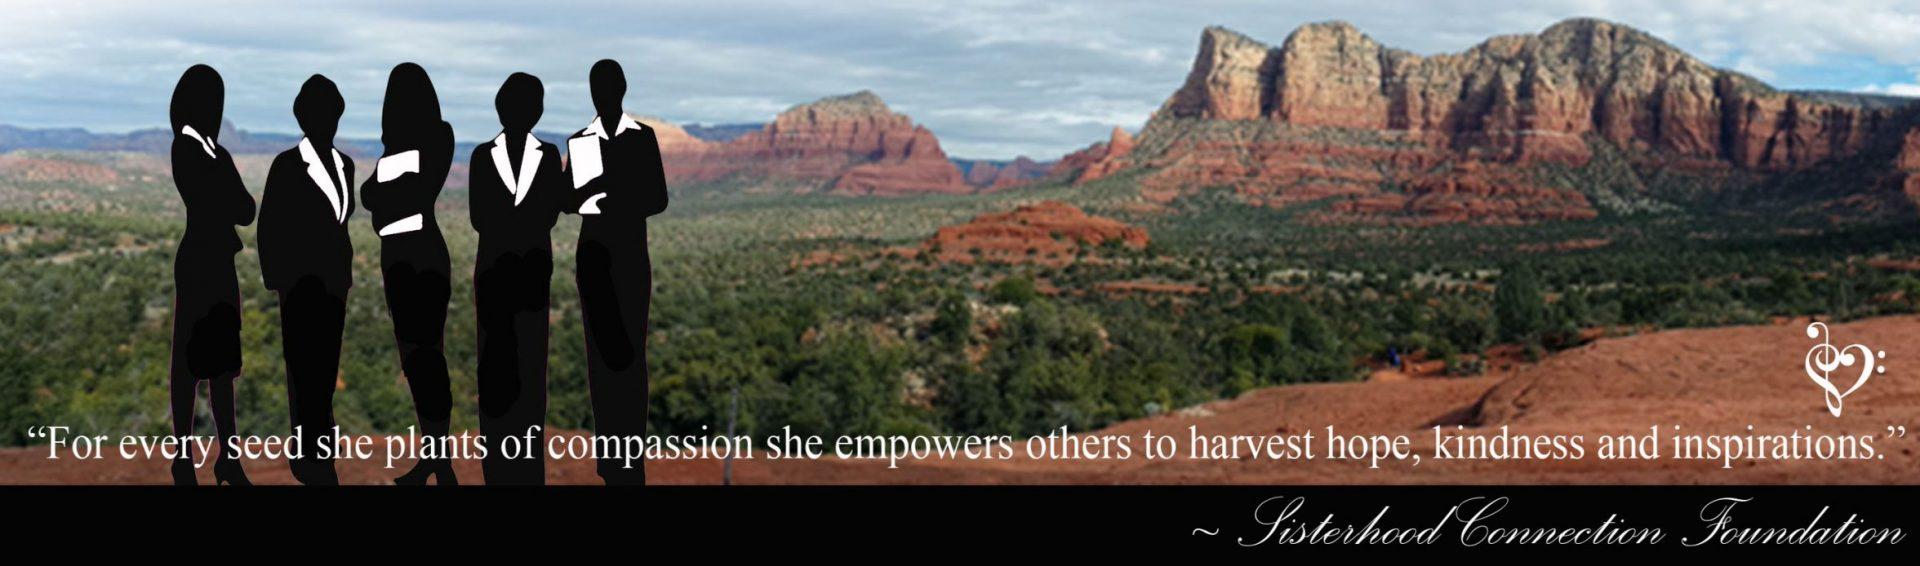 Sisterhood Connection Foundation, Inc.